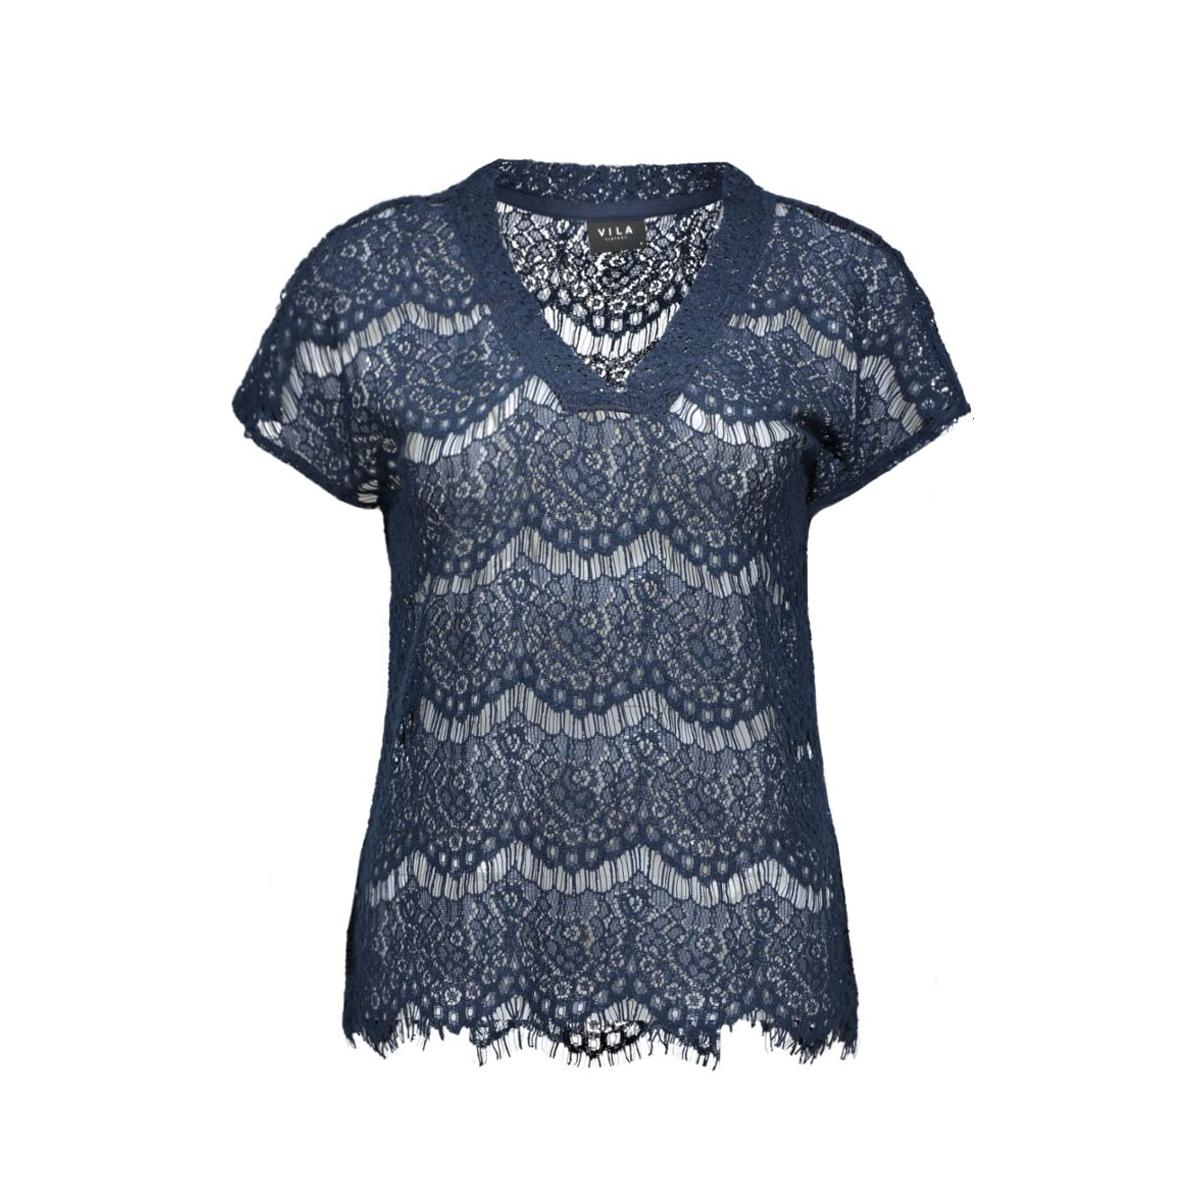 viamira top tb 14036480 vila t-shirt total eclipse